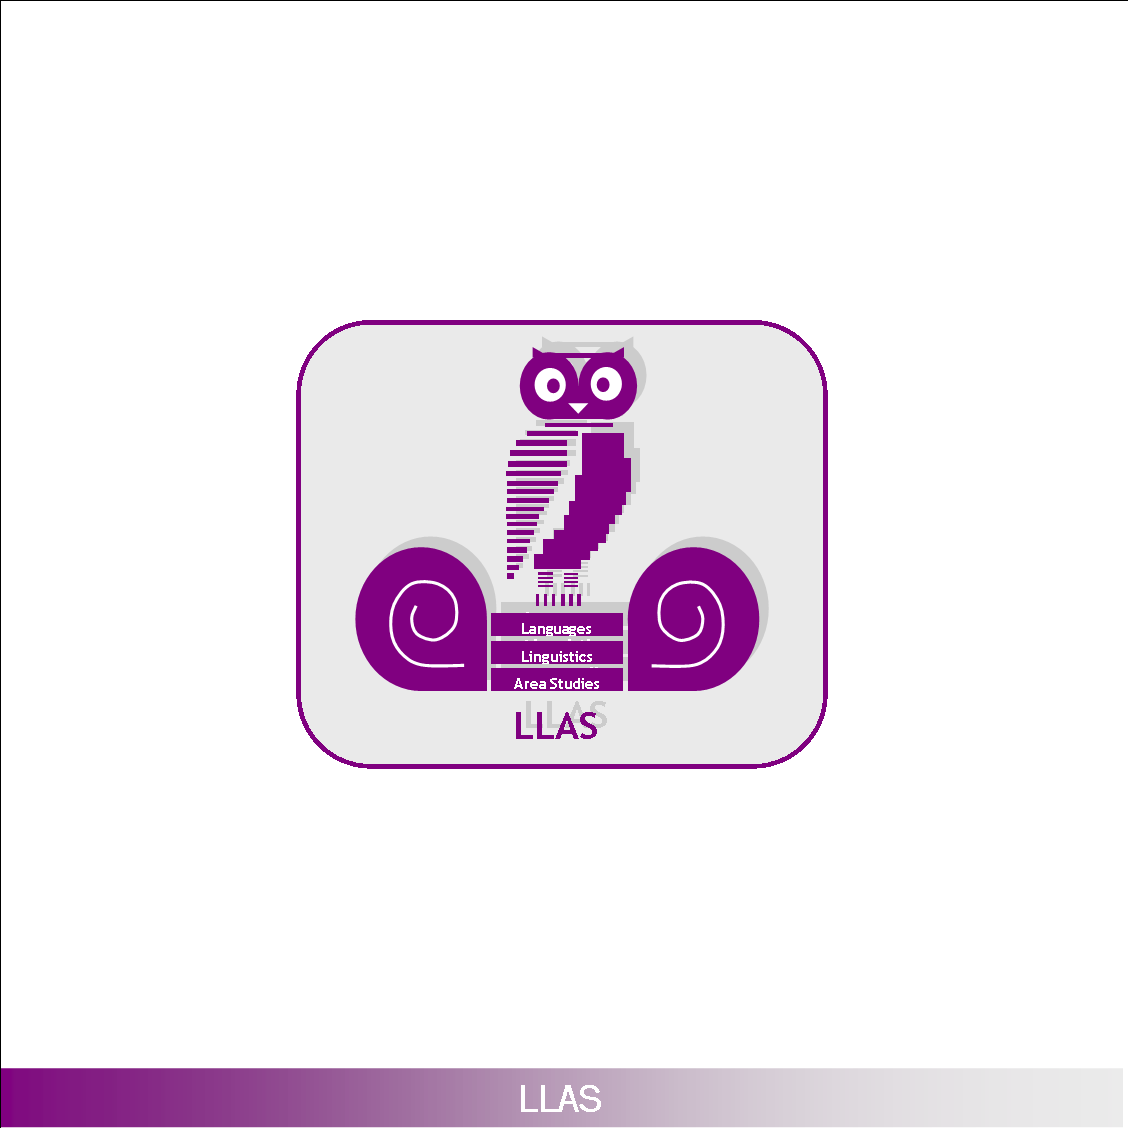 Logo Design by nk - Entry No. 72 in the Logo Design Contest Centre for Languages, Linguistics & Area Studies REBRAND.